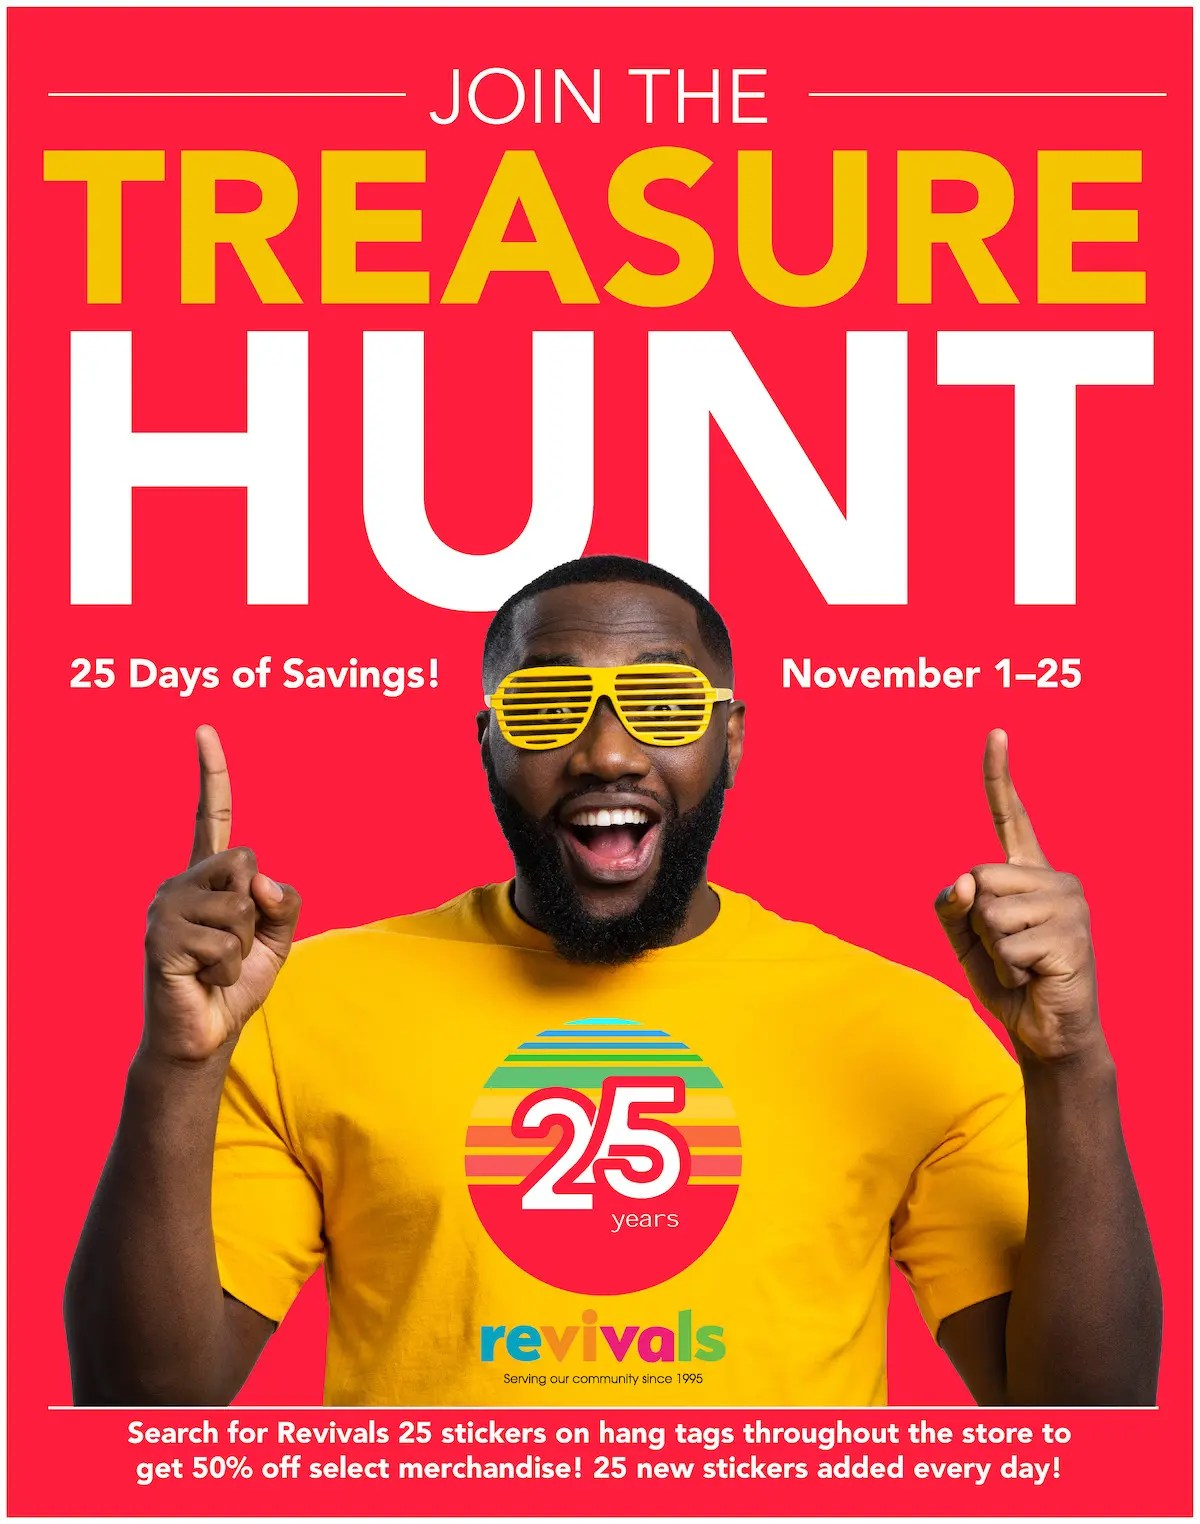 Revivals 25 Treasure Hunt Posters 2_02